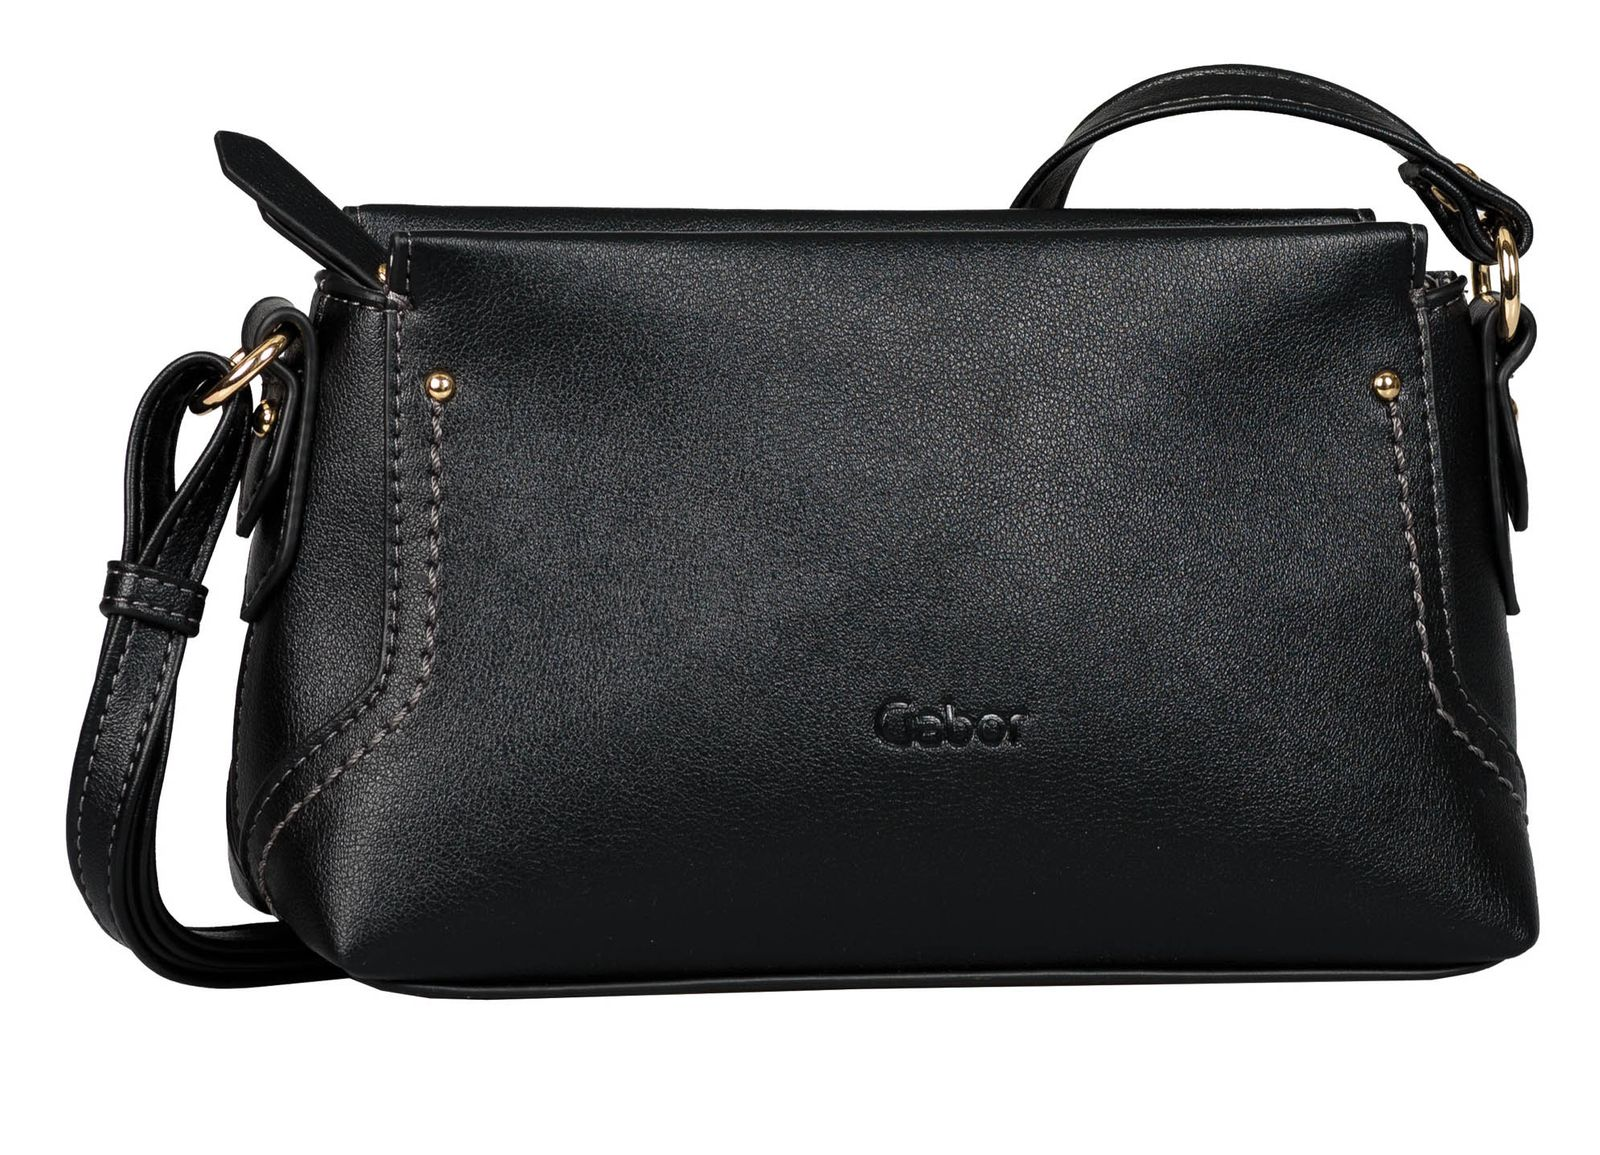 Gabor Sarda Crossover Bag Black